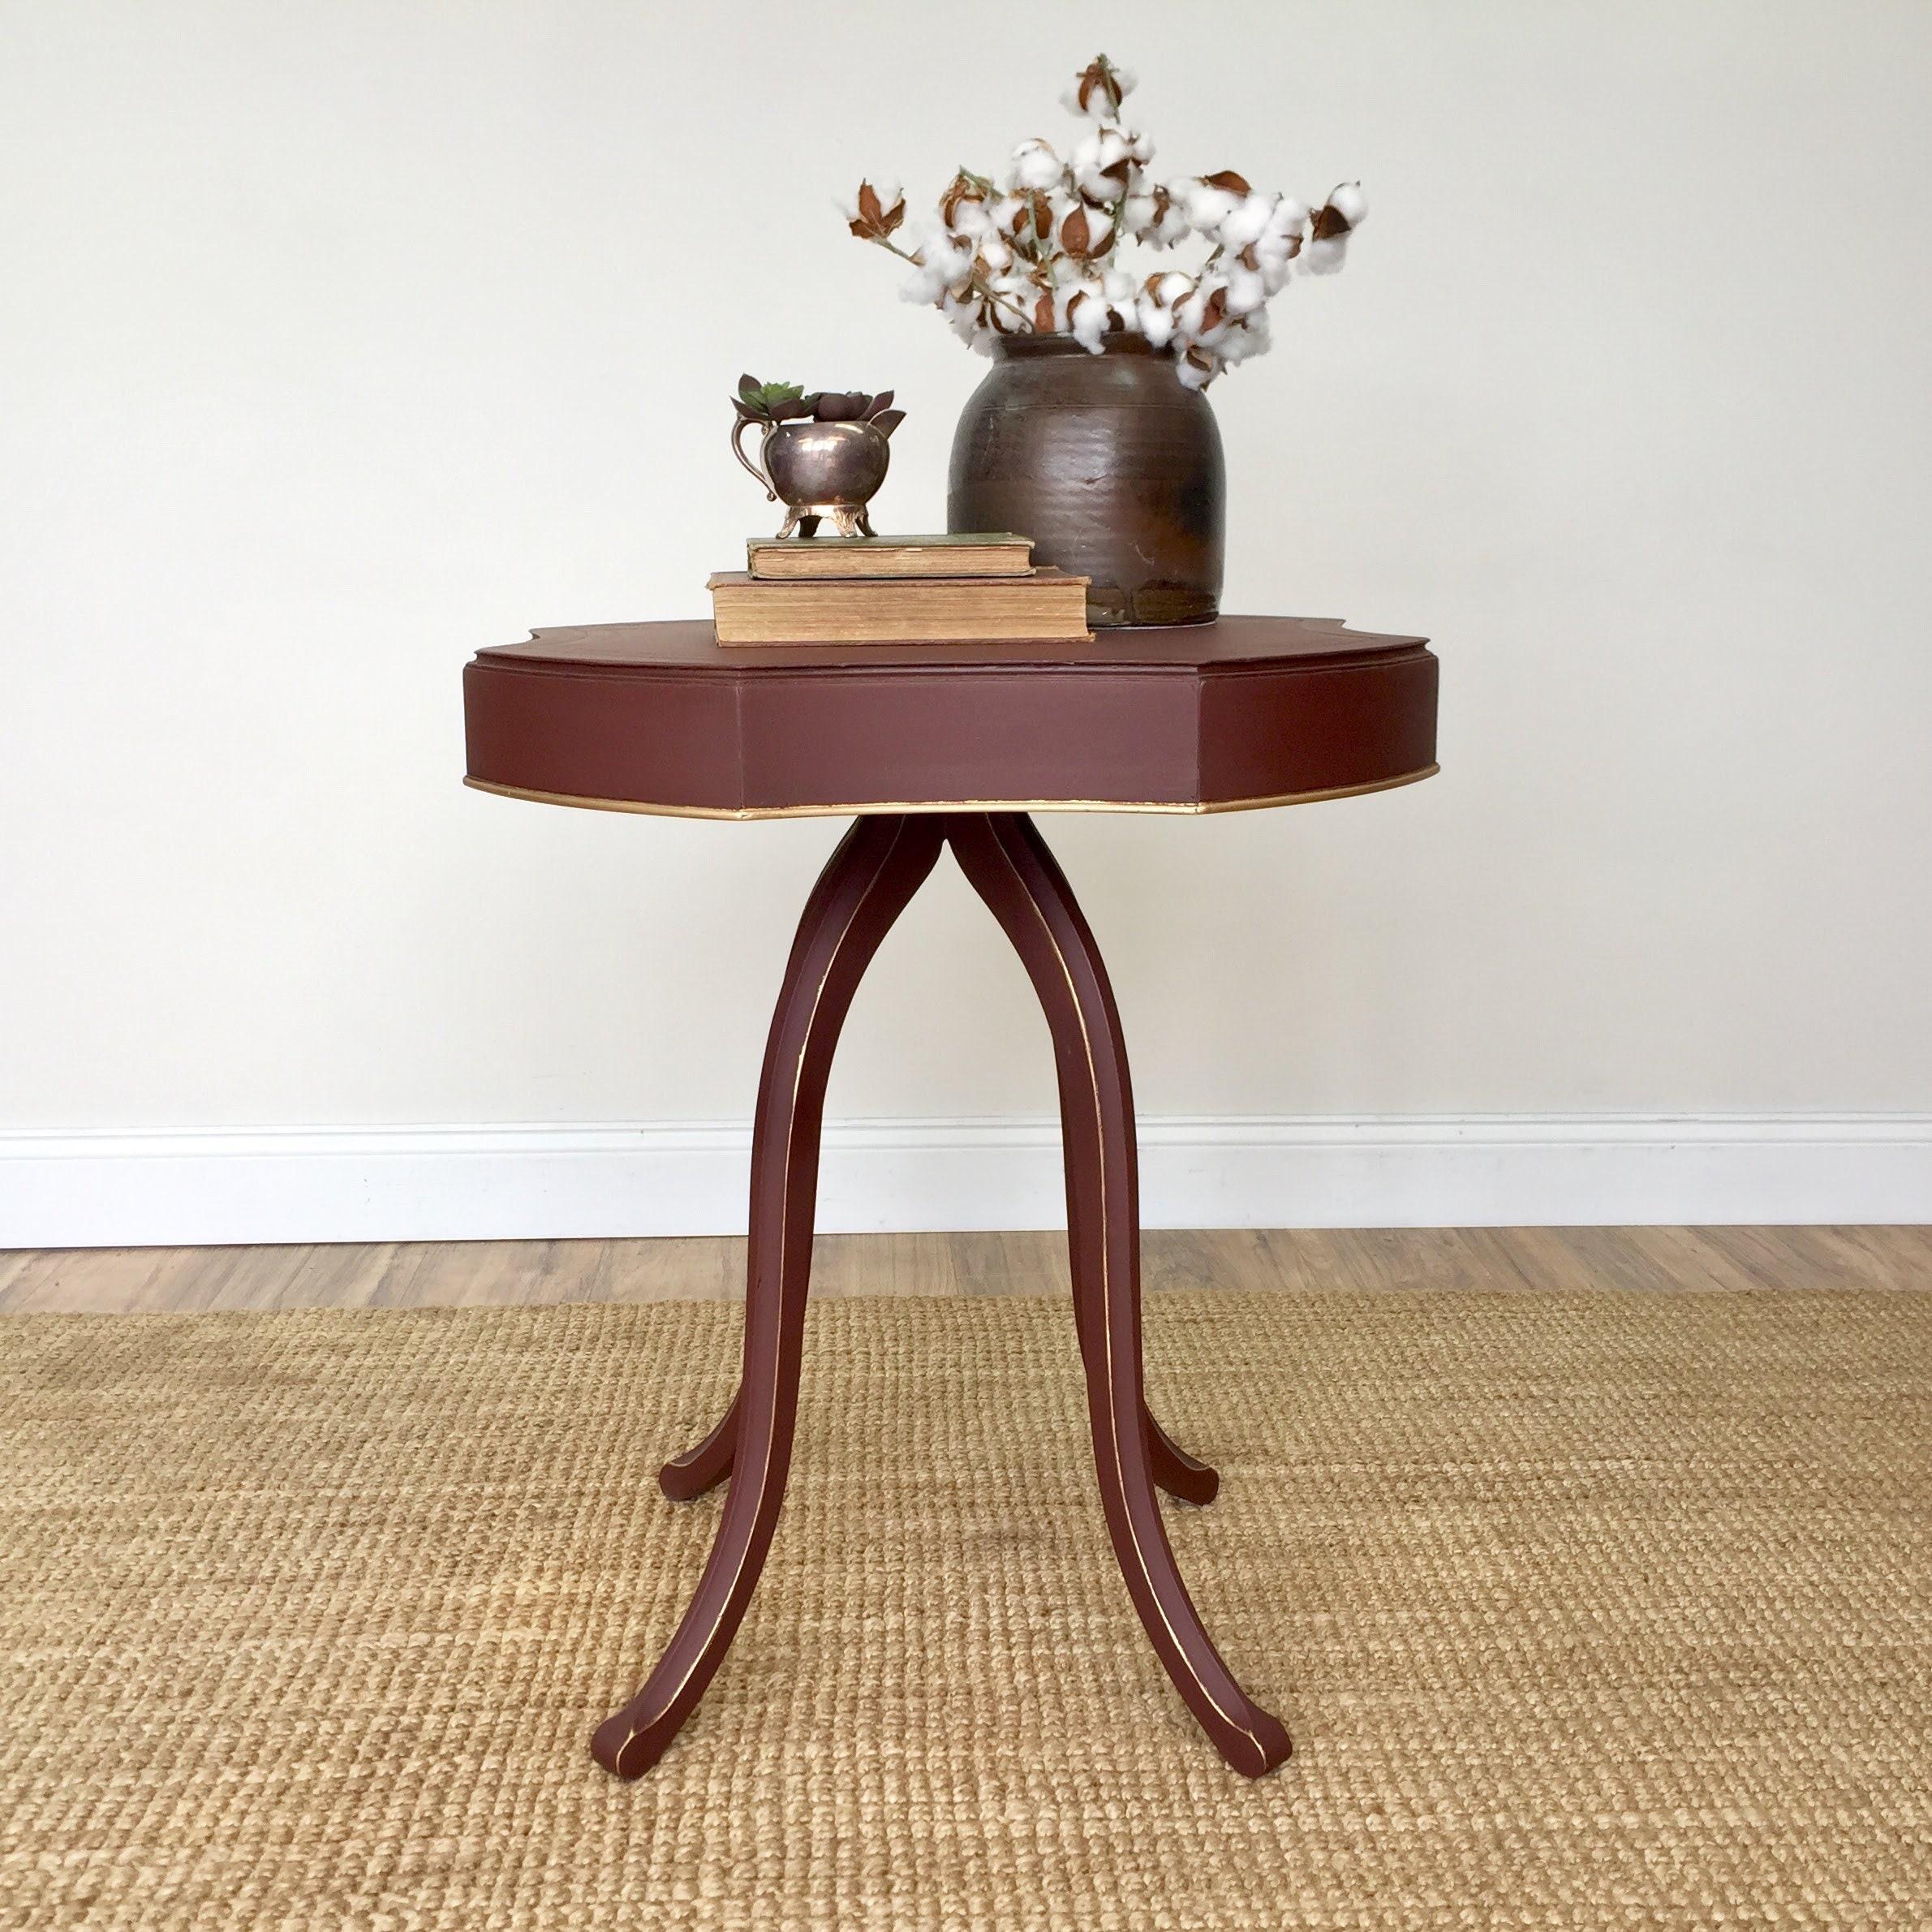 Unique And Vintage Furniture: Red Antique End Table Sofa Side Table Unique Furniture